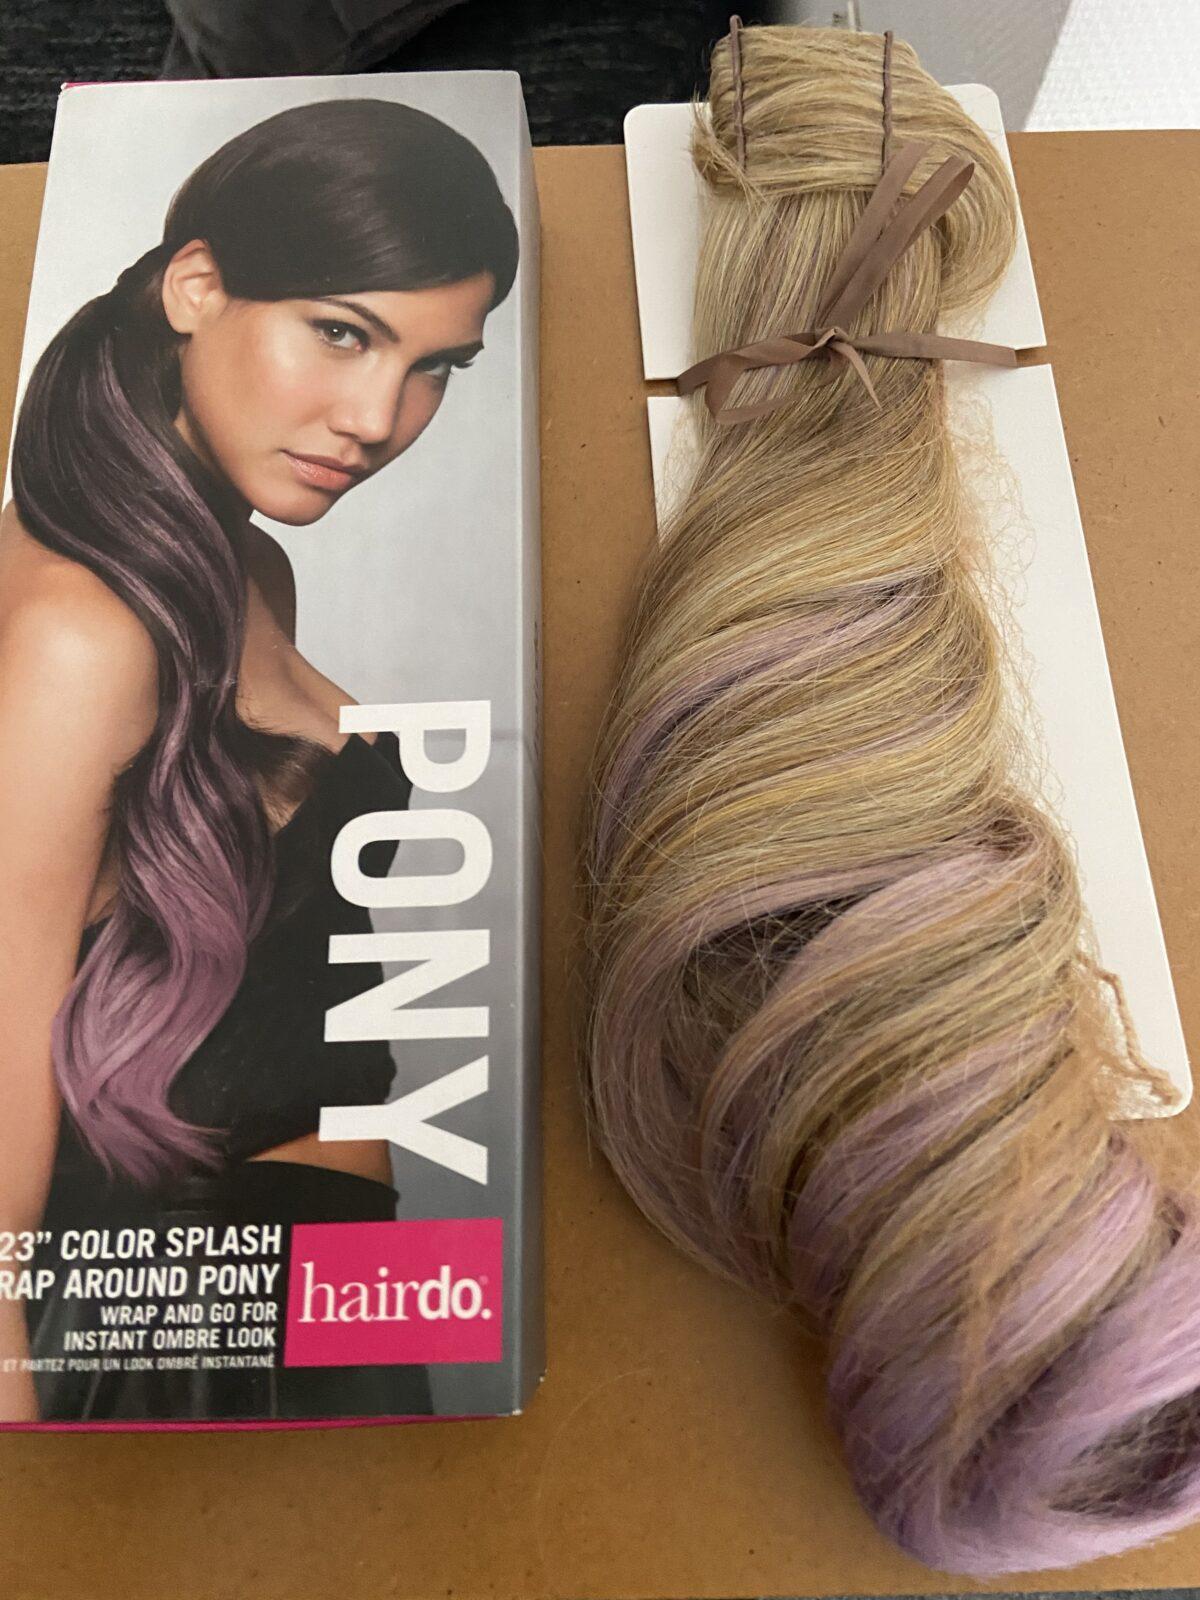 Color Splash Wrap Around Pony Godblond-Mix - Lavendel